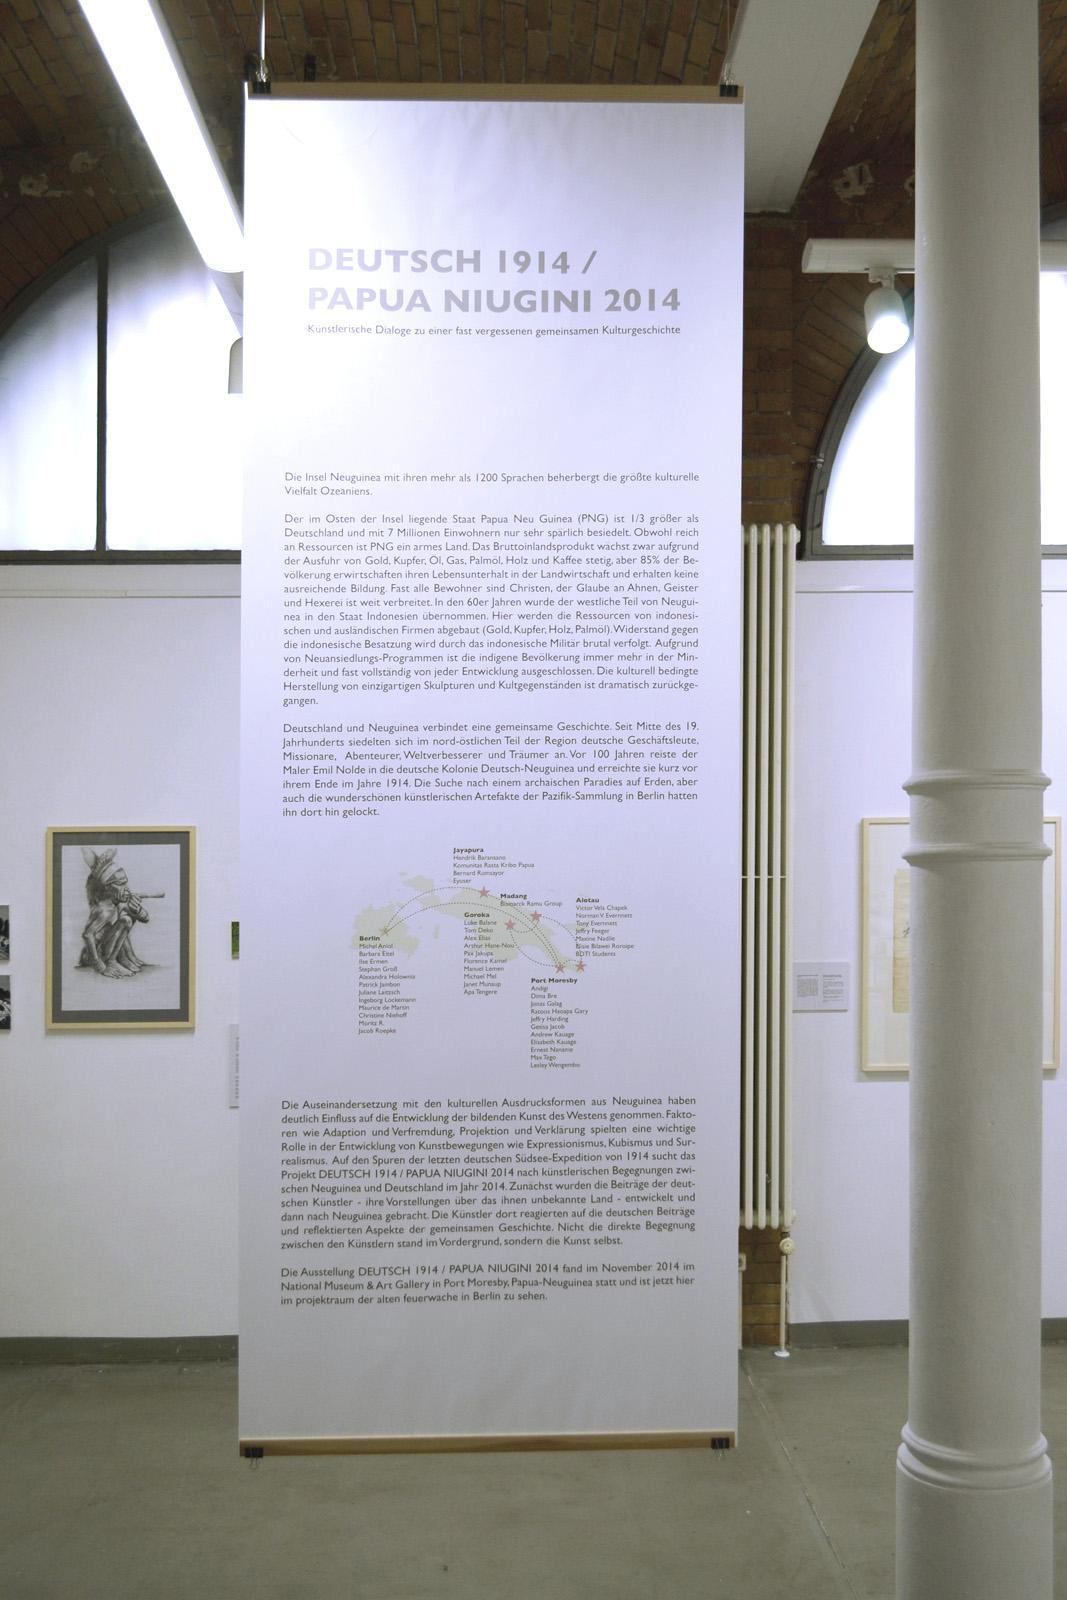 Michel Aniol Papua Neuguinea Alfred Banze Marion Struck-Garbe Kunst Berlin Art